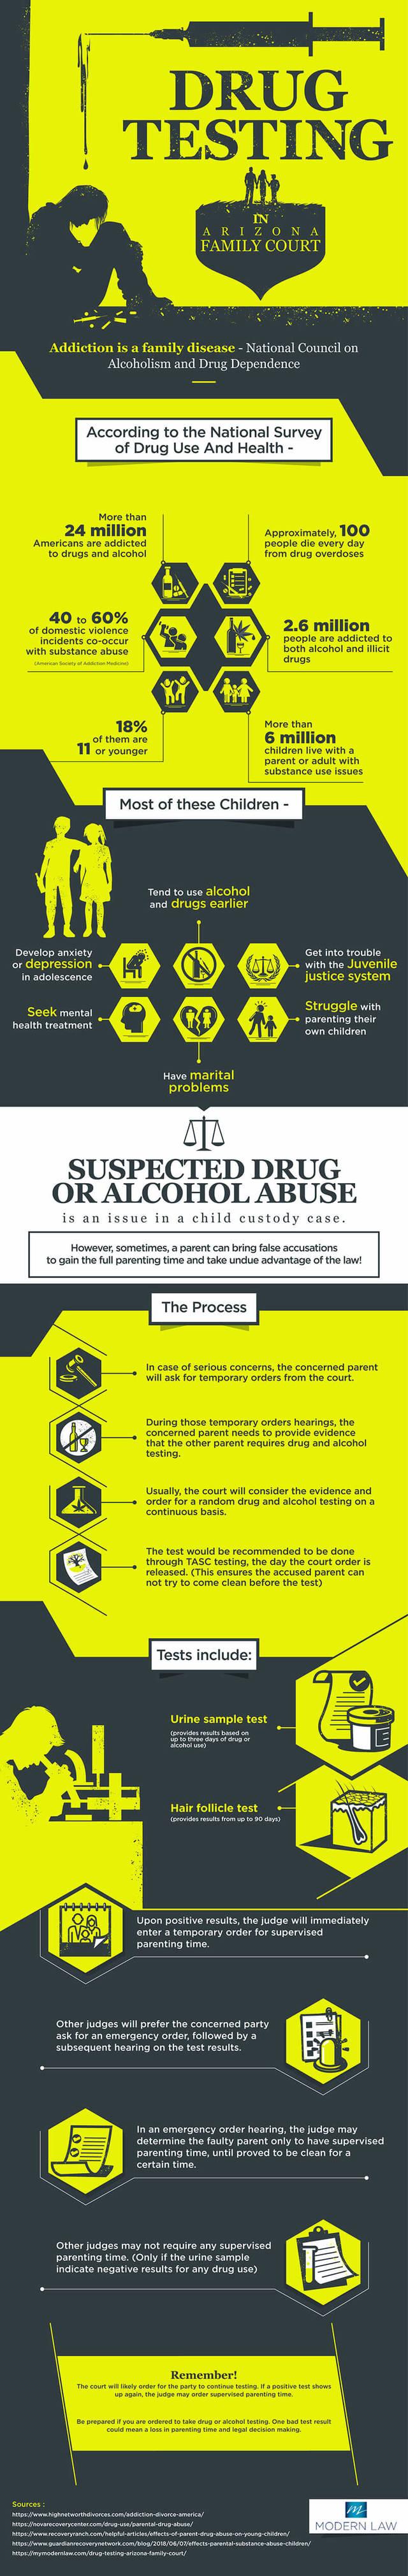 Drug testing in arizona small